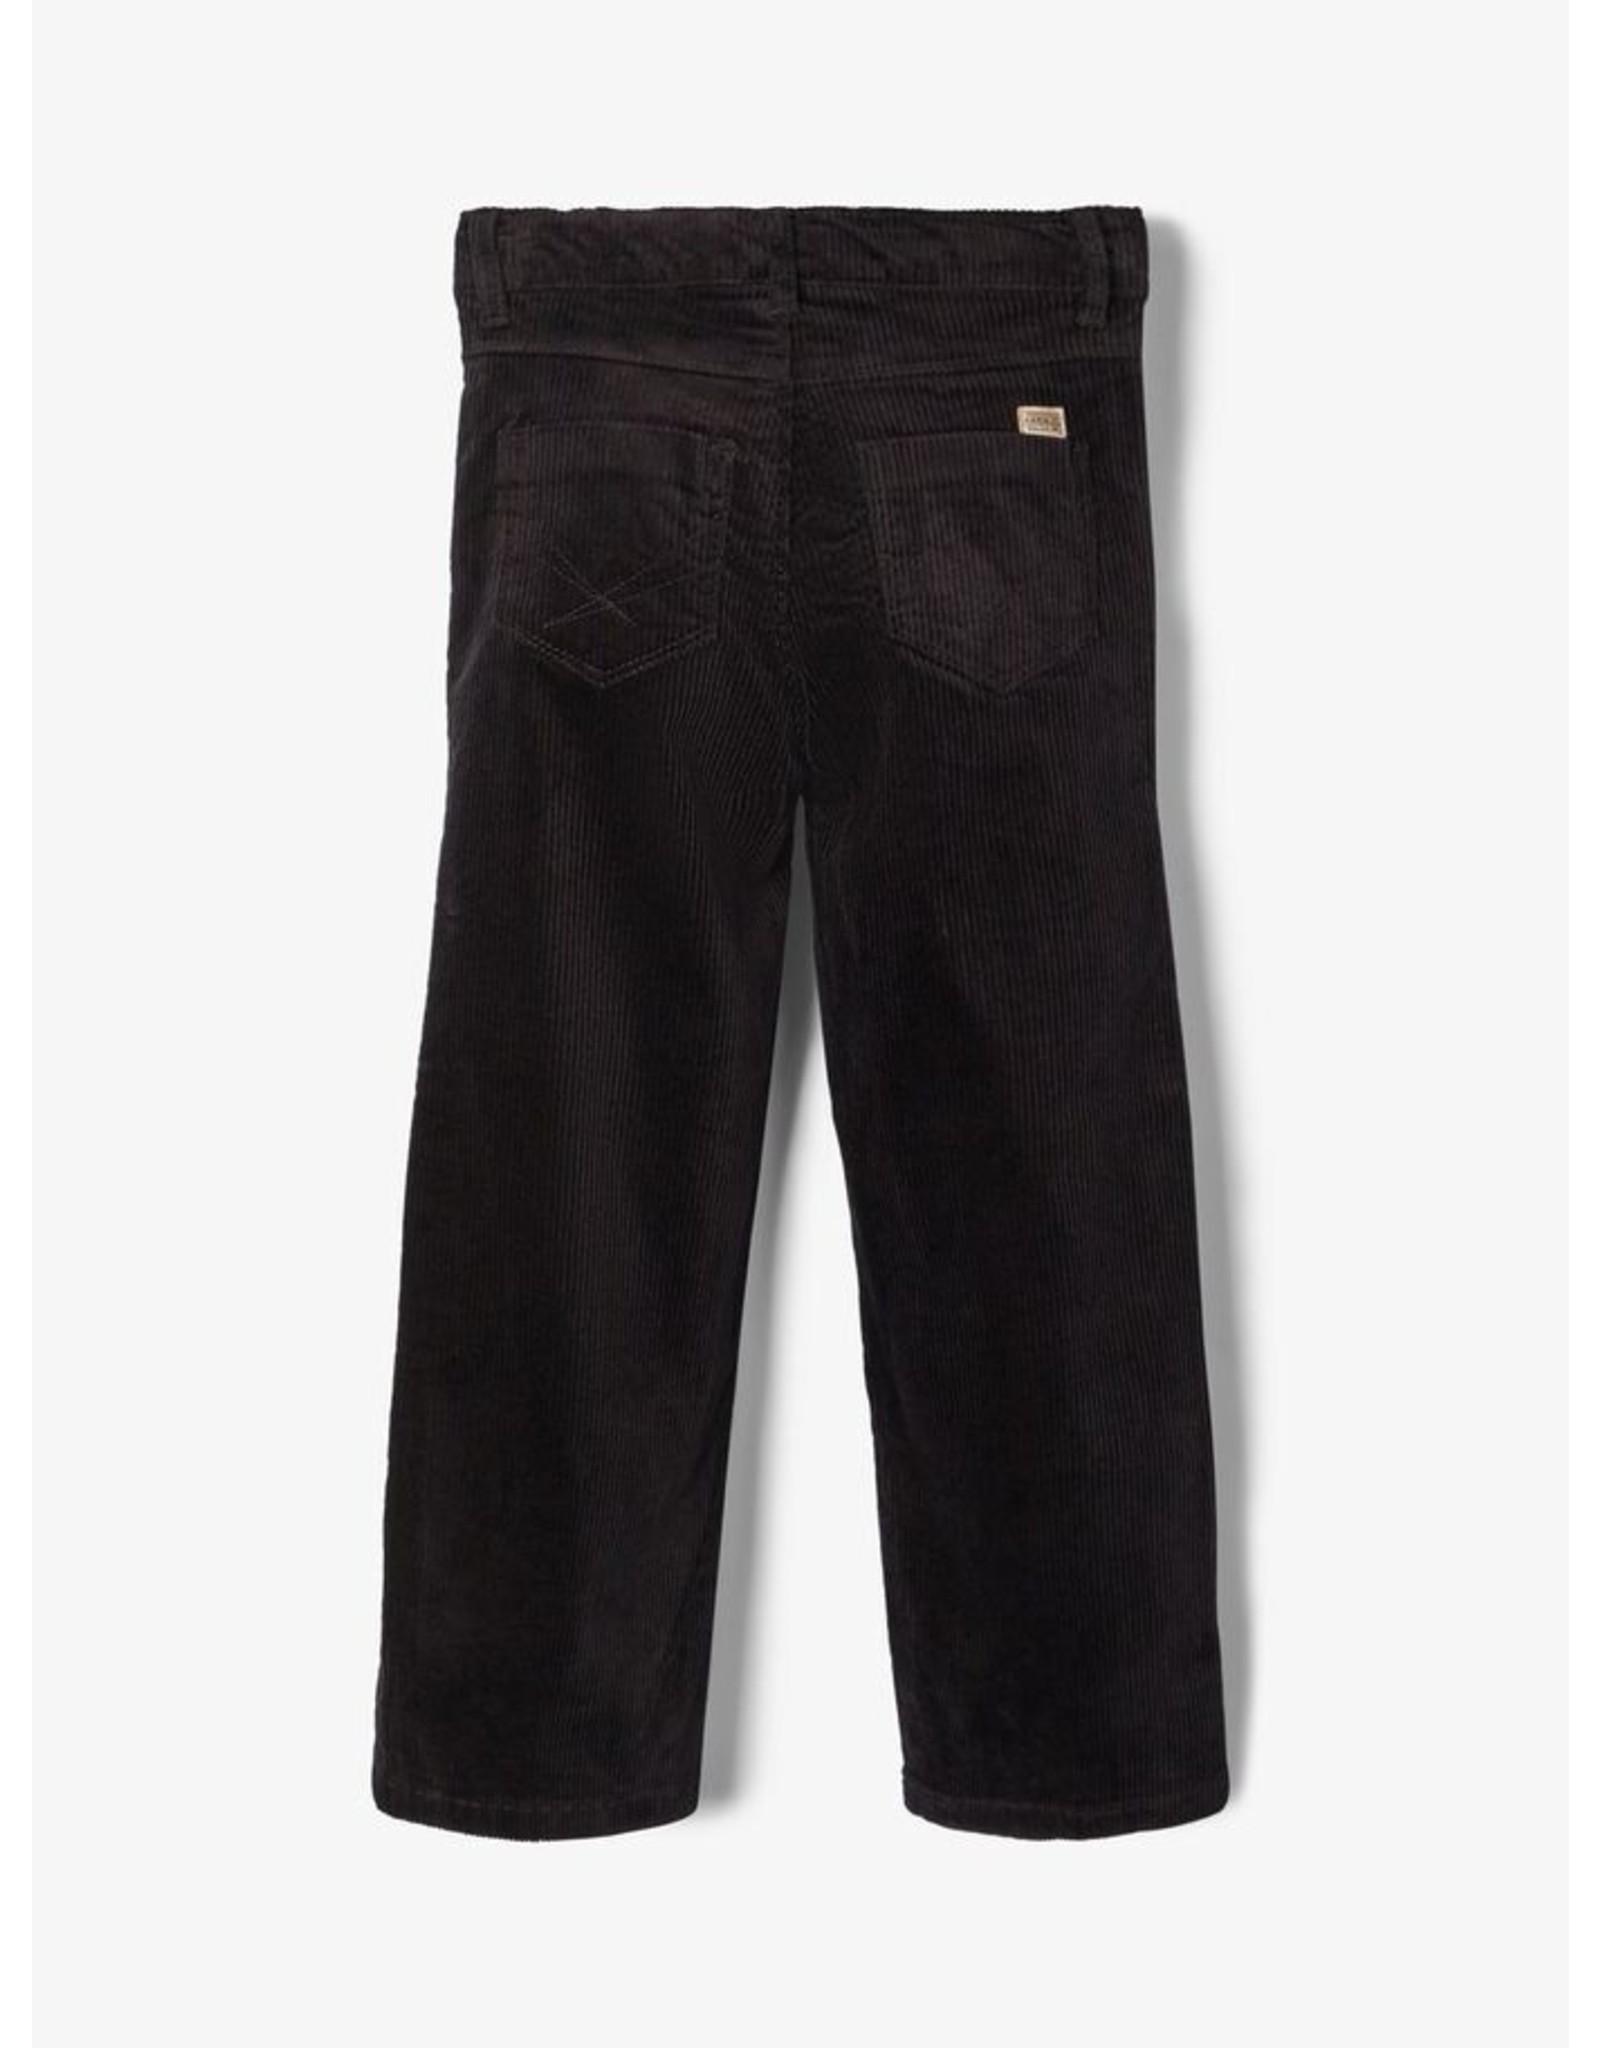 Name It Zwarte corduroy 7/8 brede broek